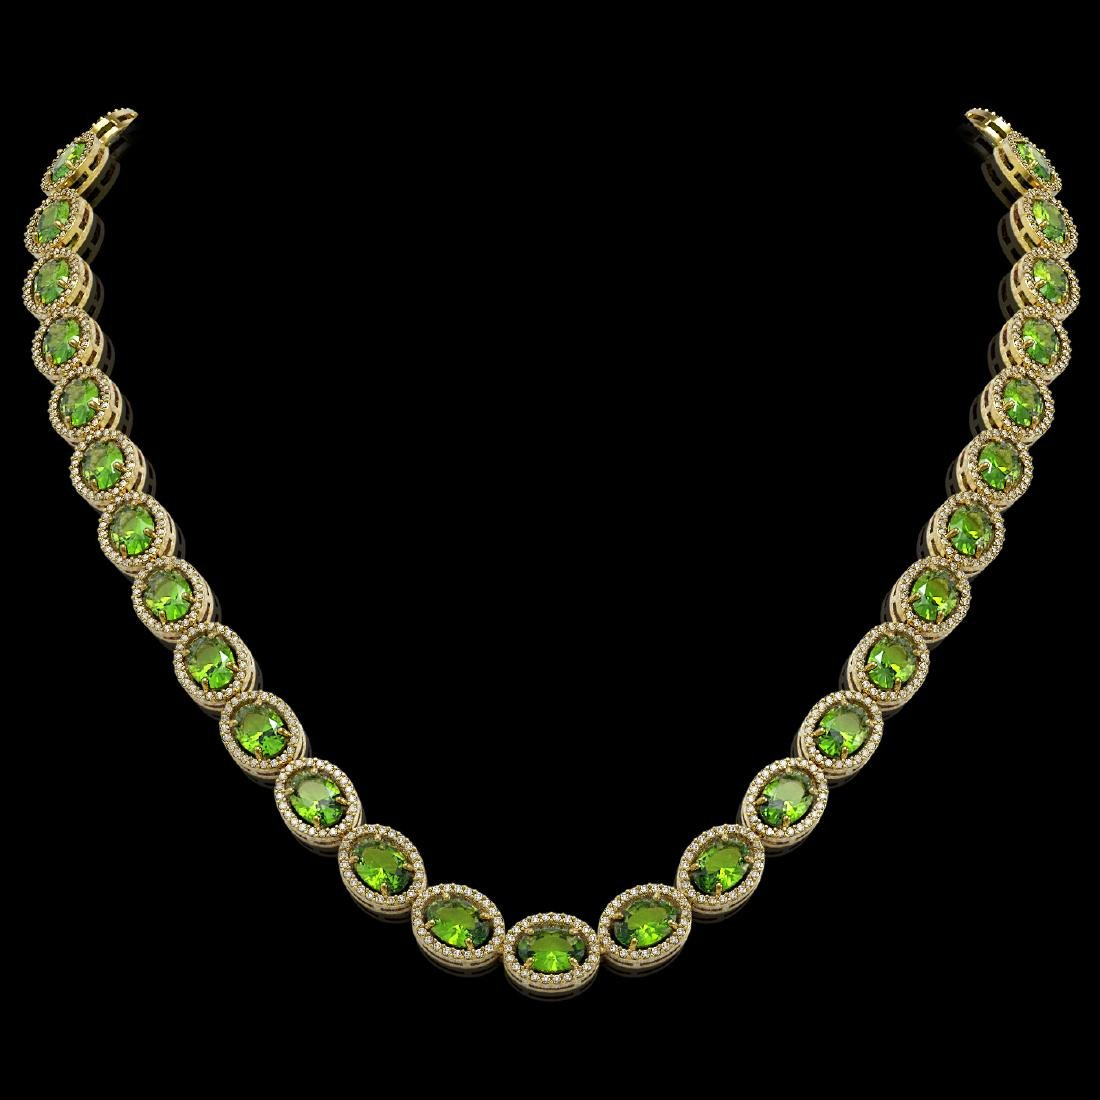 48.14 CTW Peridot & Diamond Halo Necklace 10K Yellow